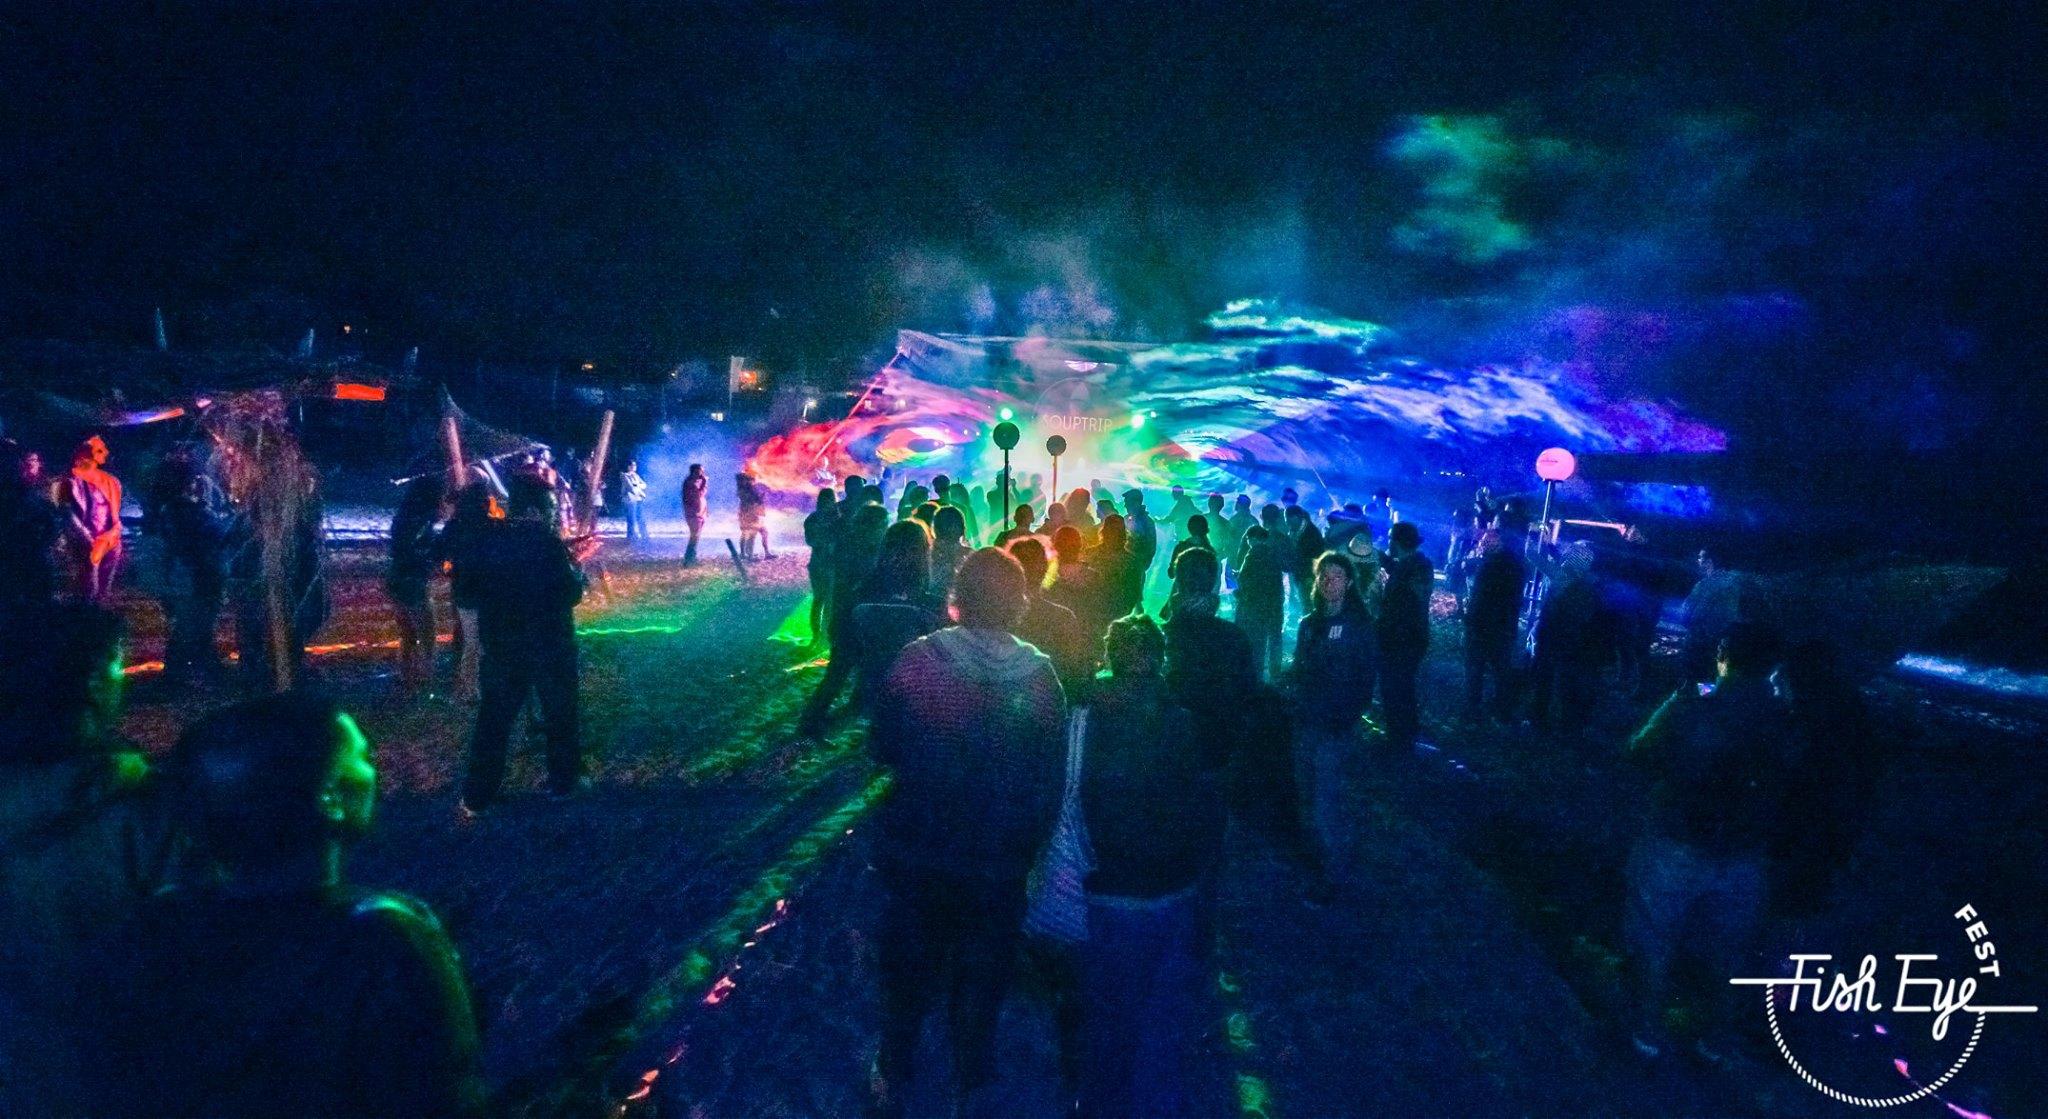 Fish Eye Fest laser show